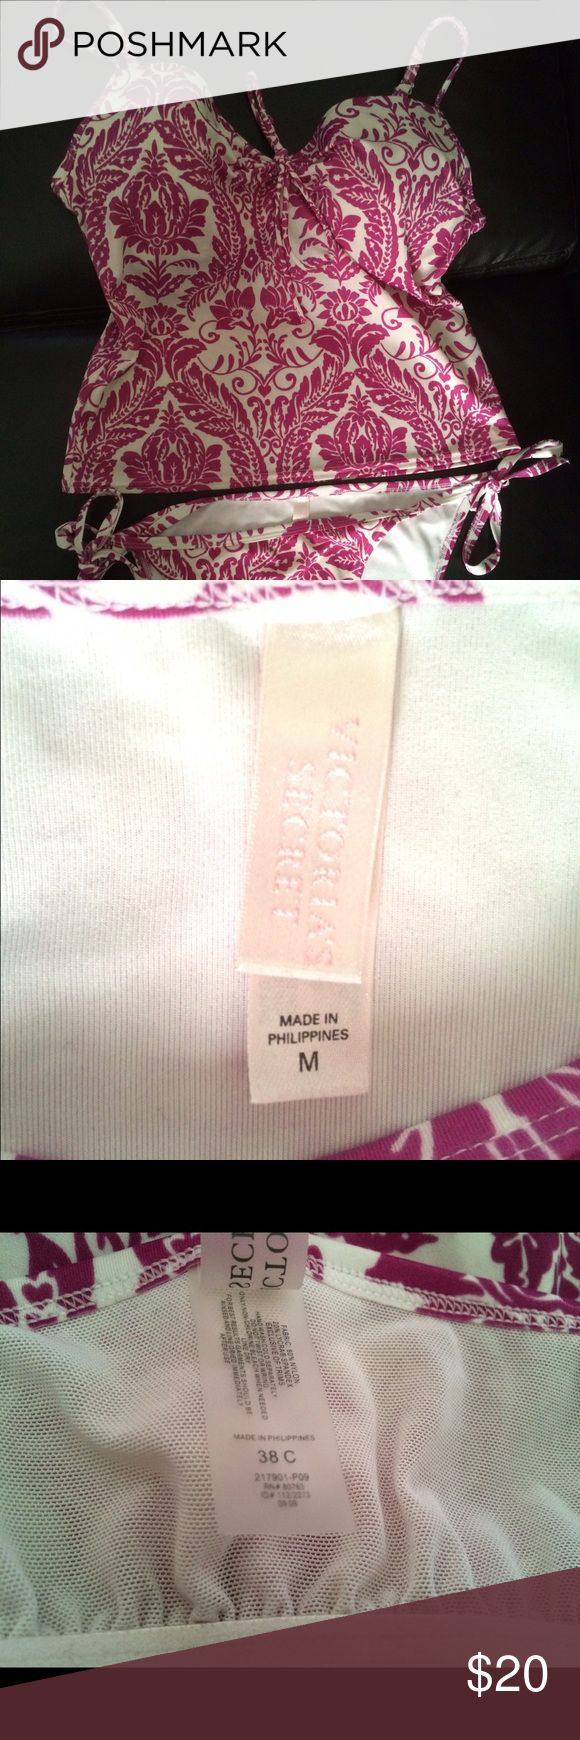 Victoria secret purple tankini swimsuit Top sz 38C. Bottom Sz. Medium. Worn once. PINK Victoria's Secret Swim Bikinis